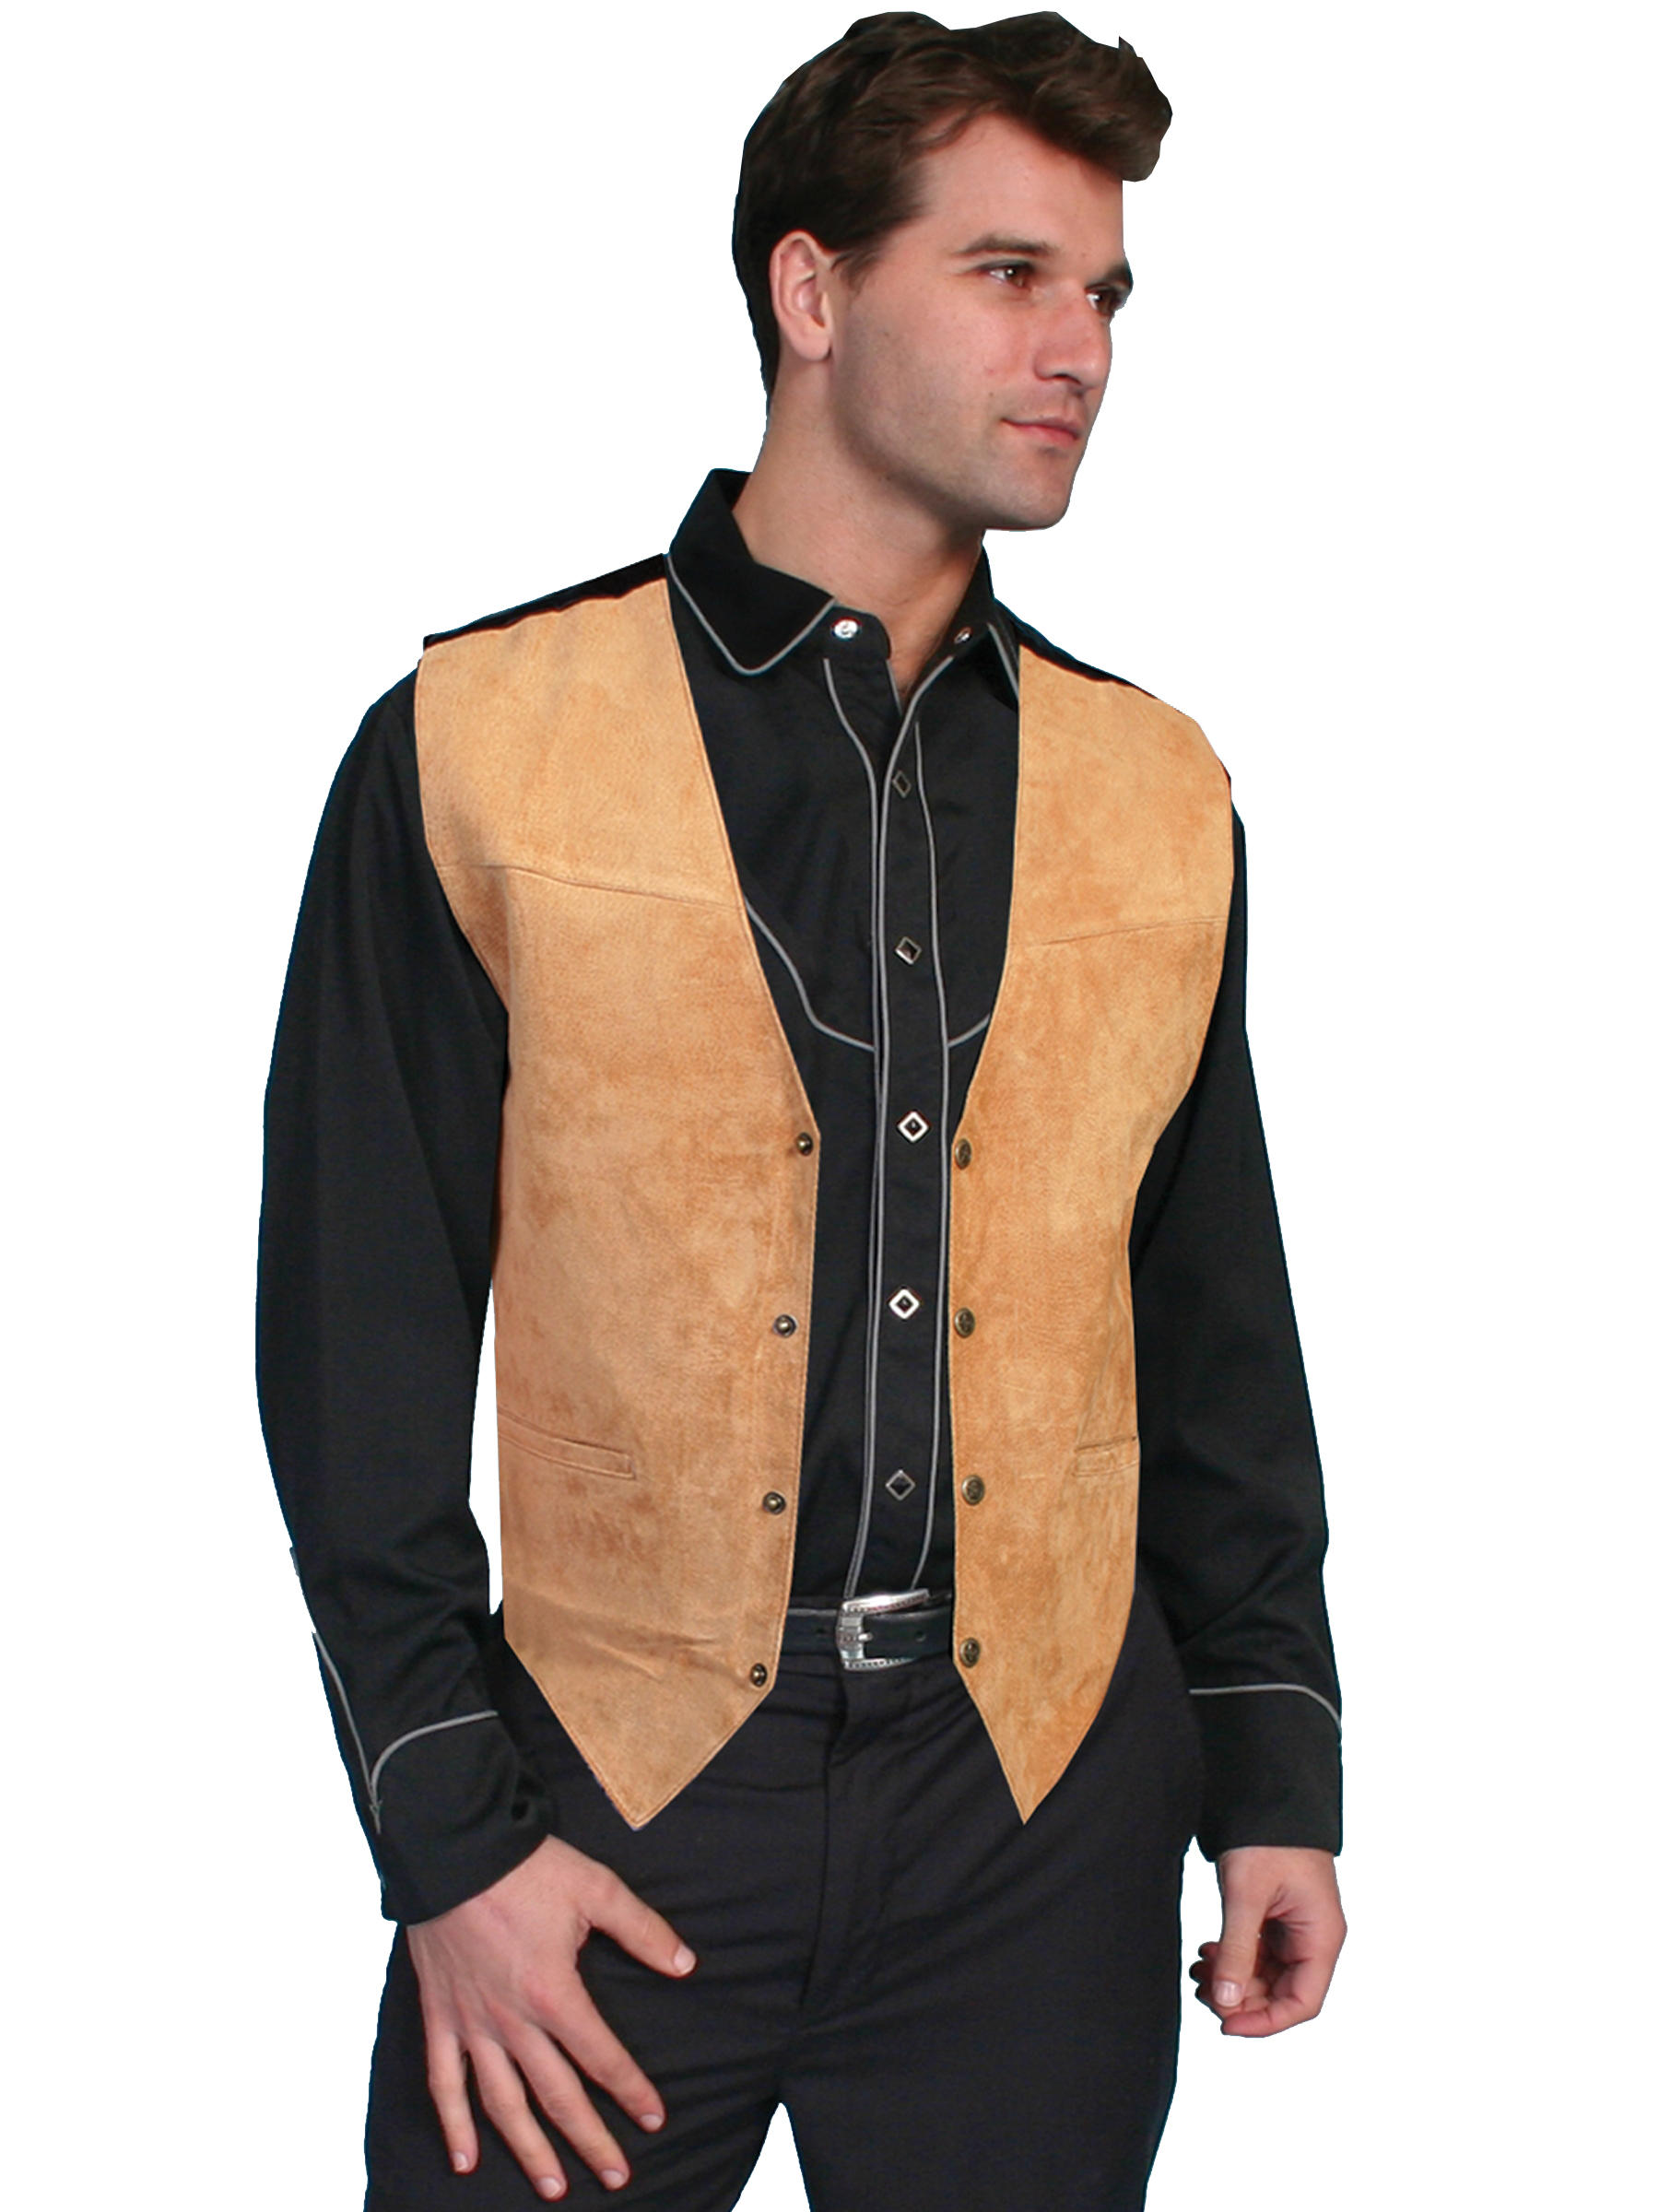 Boar suede snap front vest